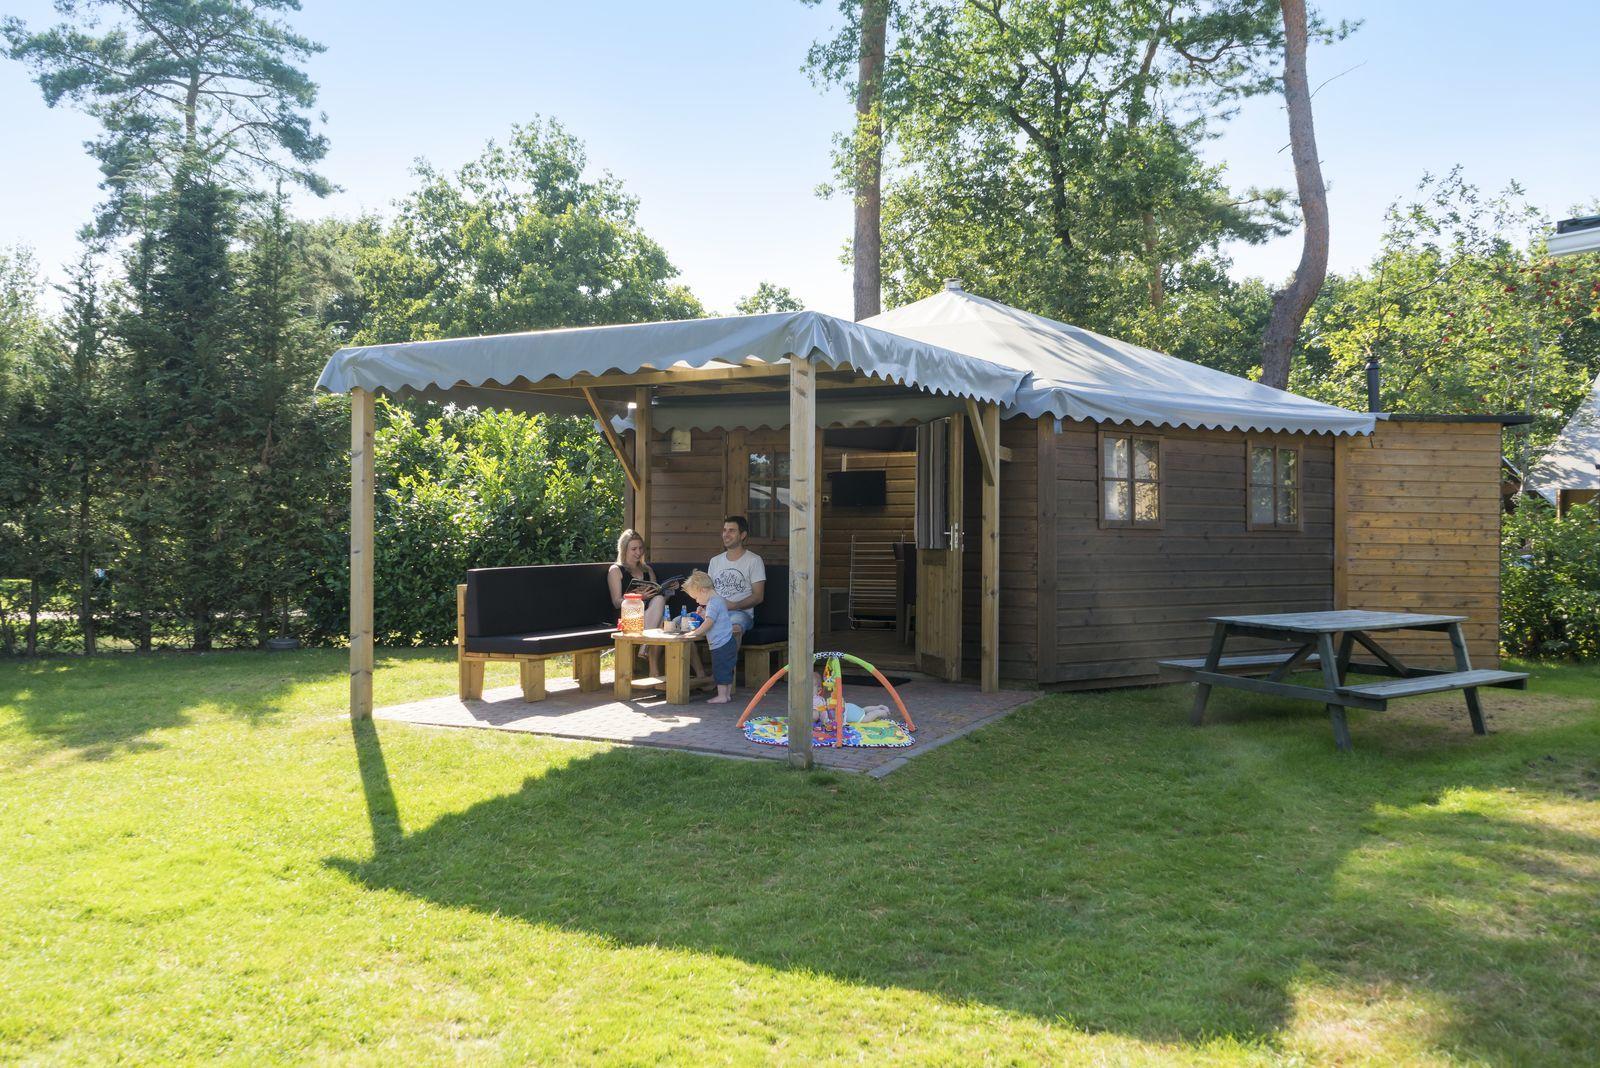 Berks forest hut